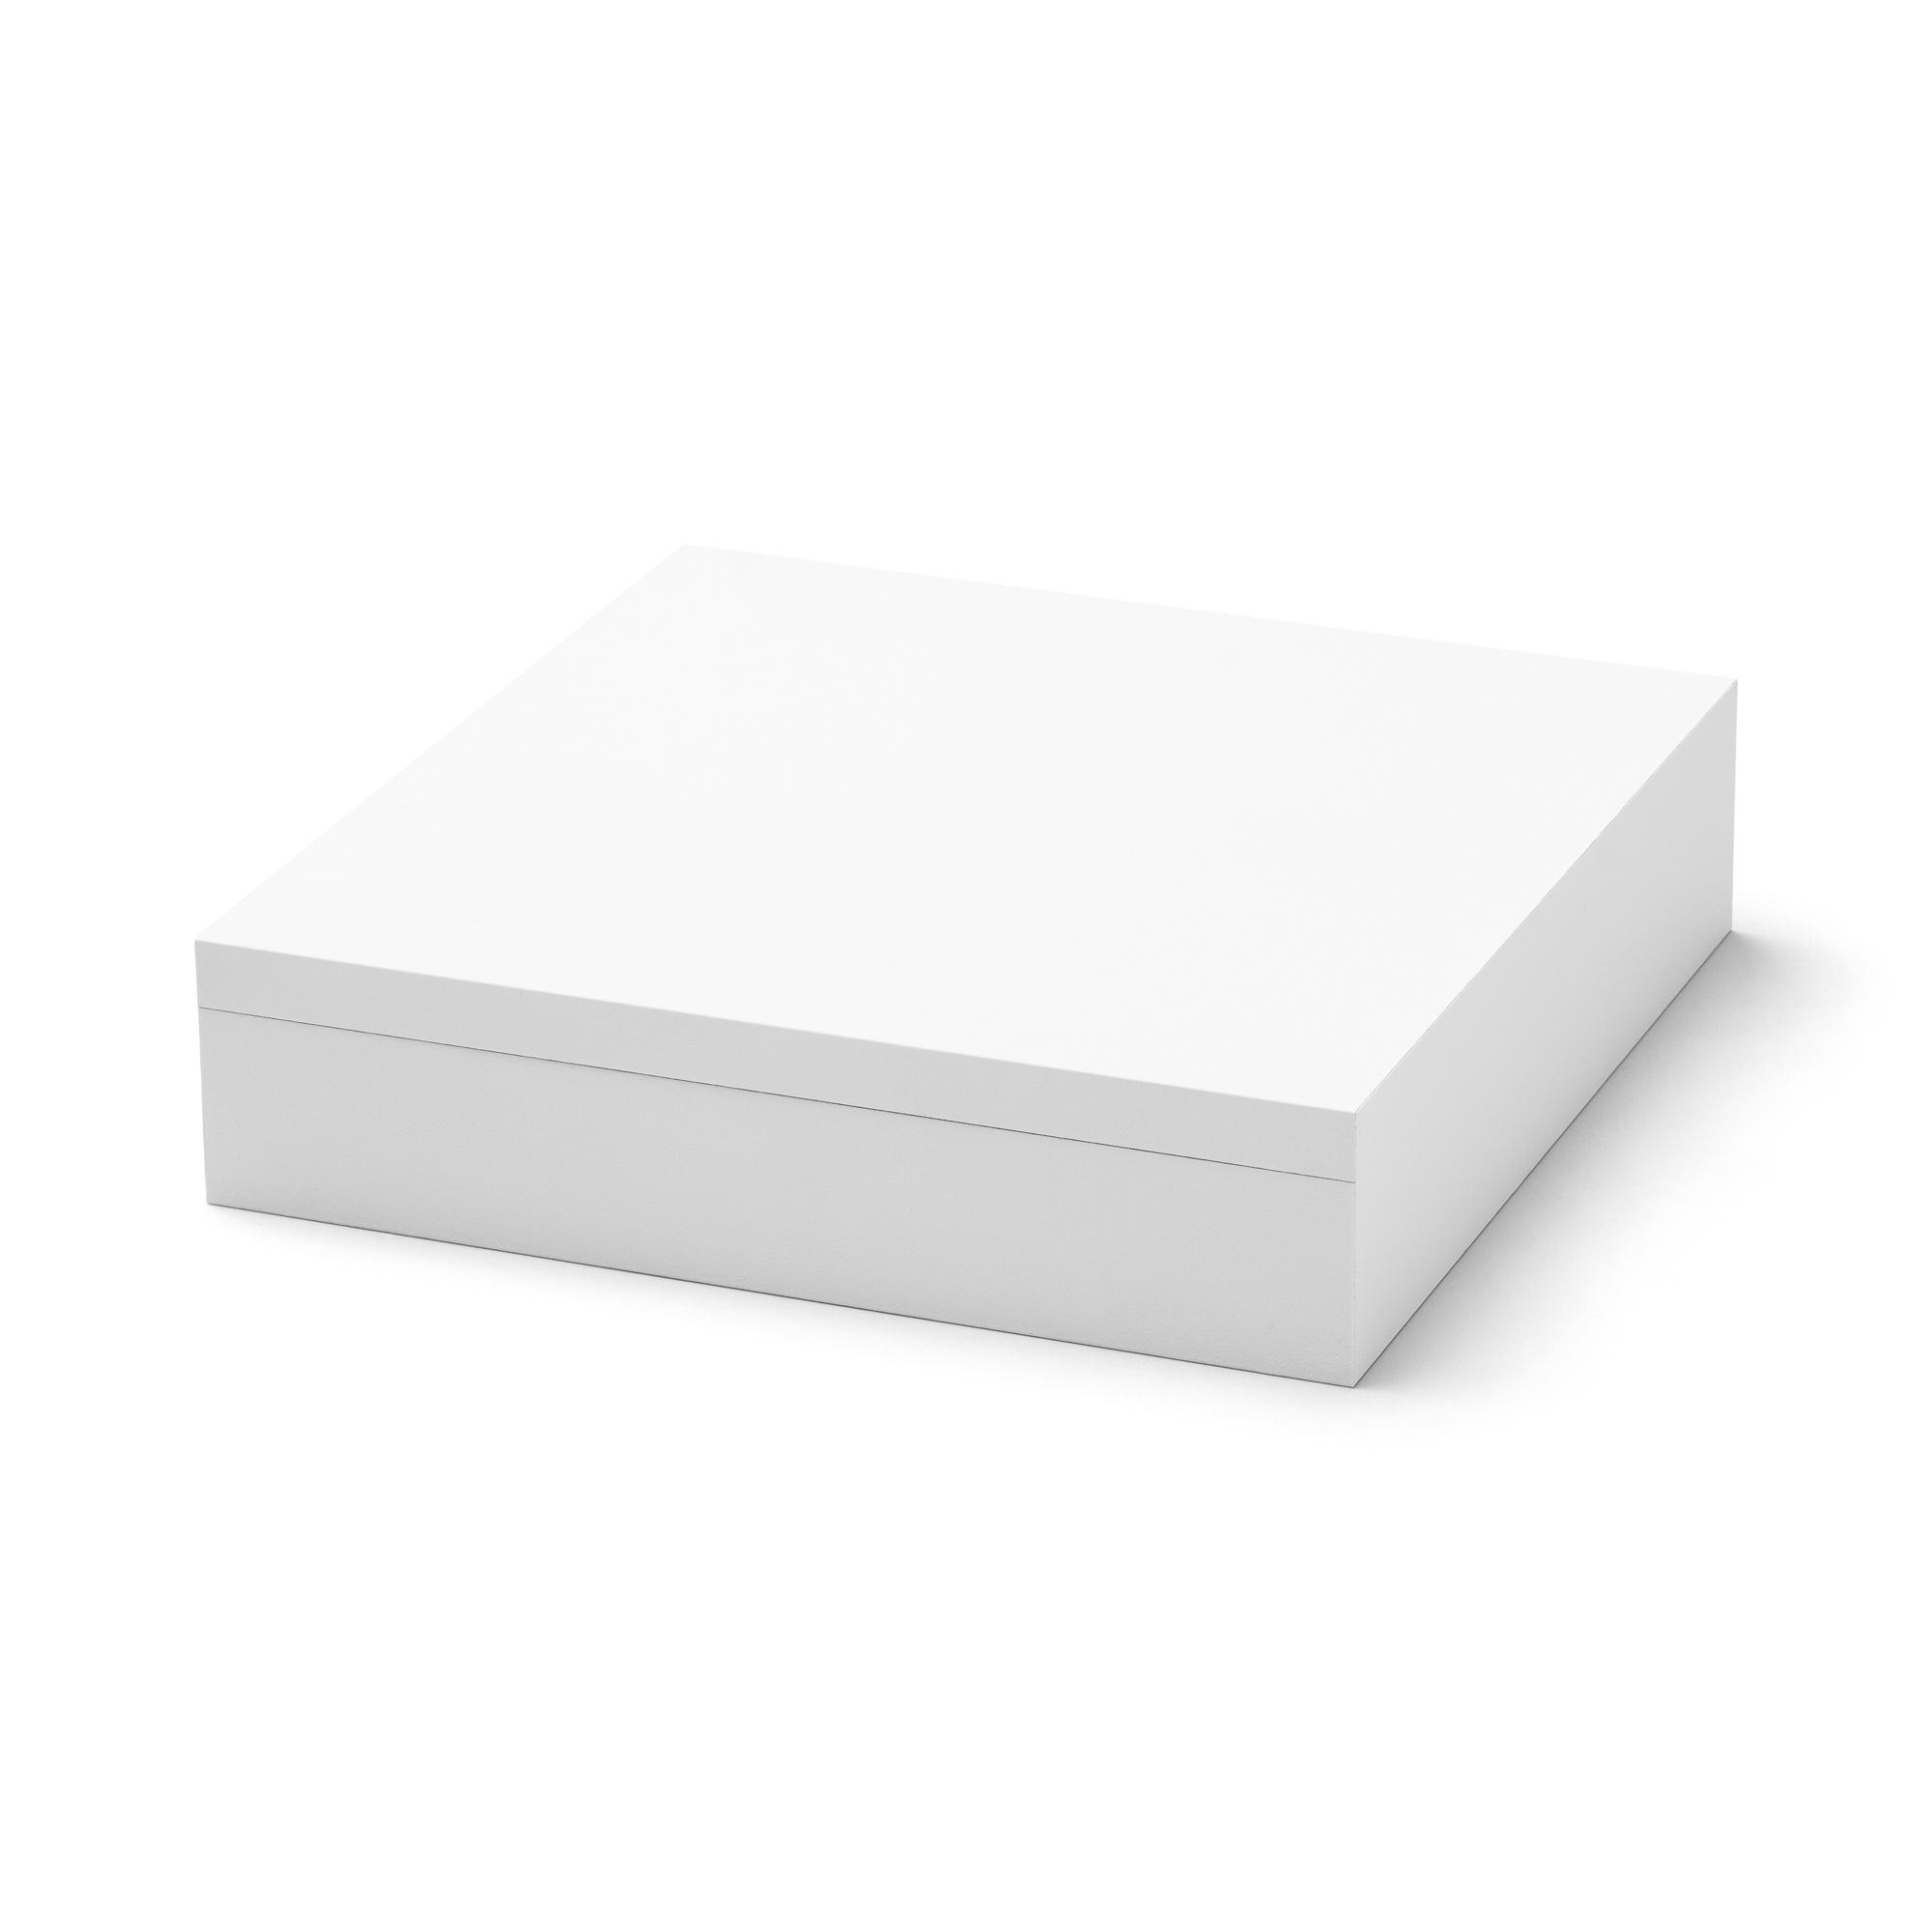 WHITEBOX Kette